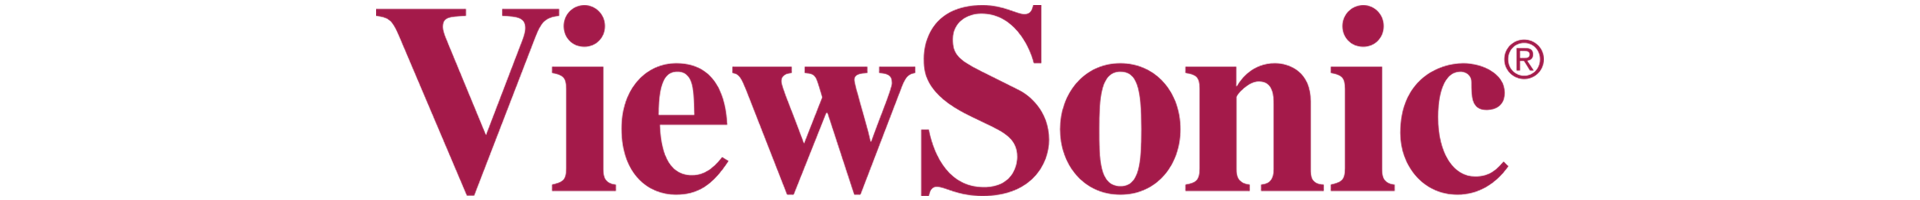 1920px-ViewSonic_logo short